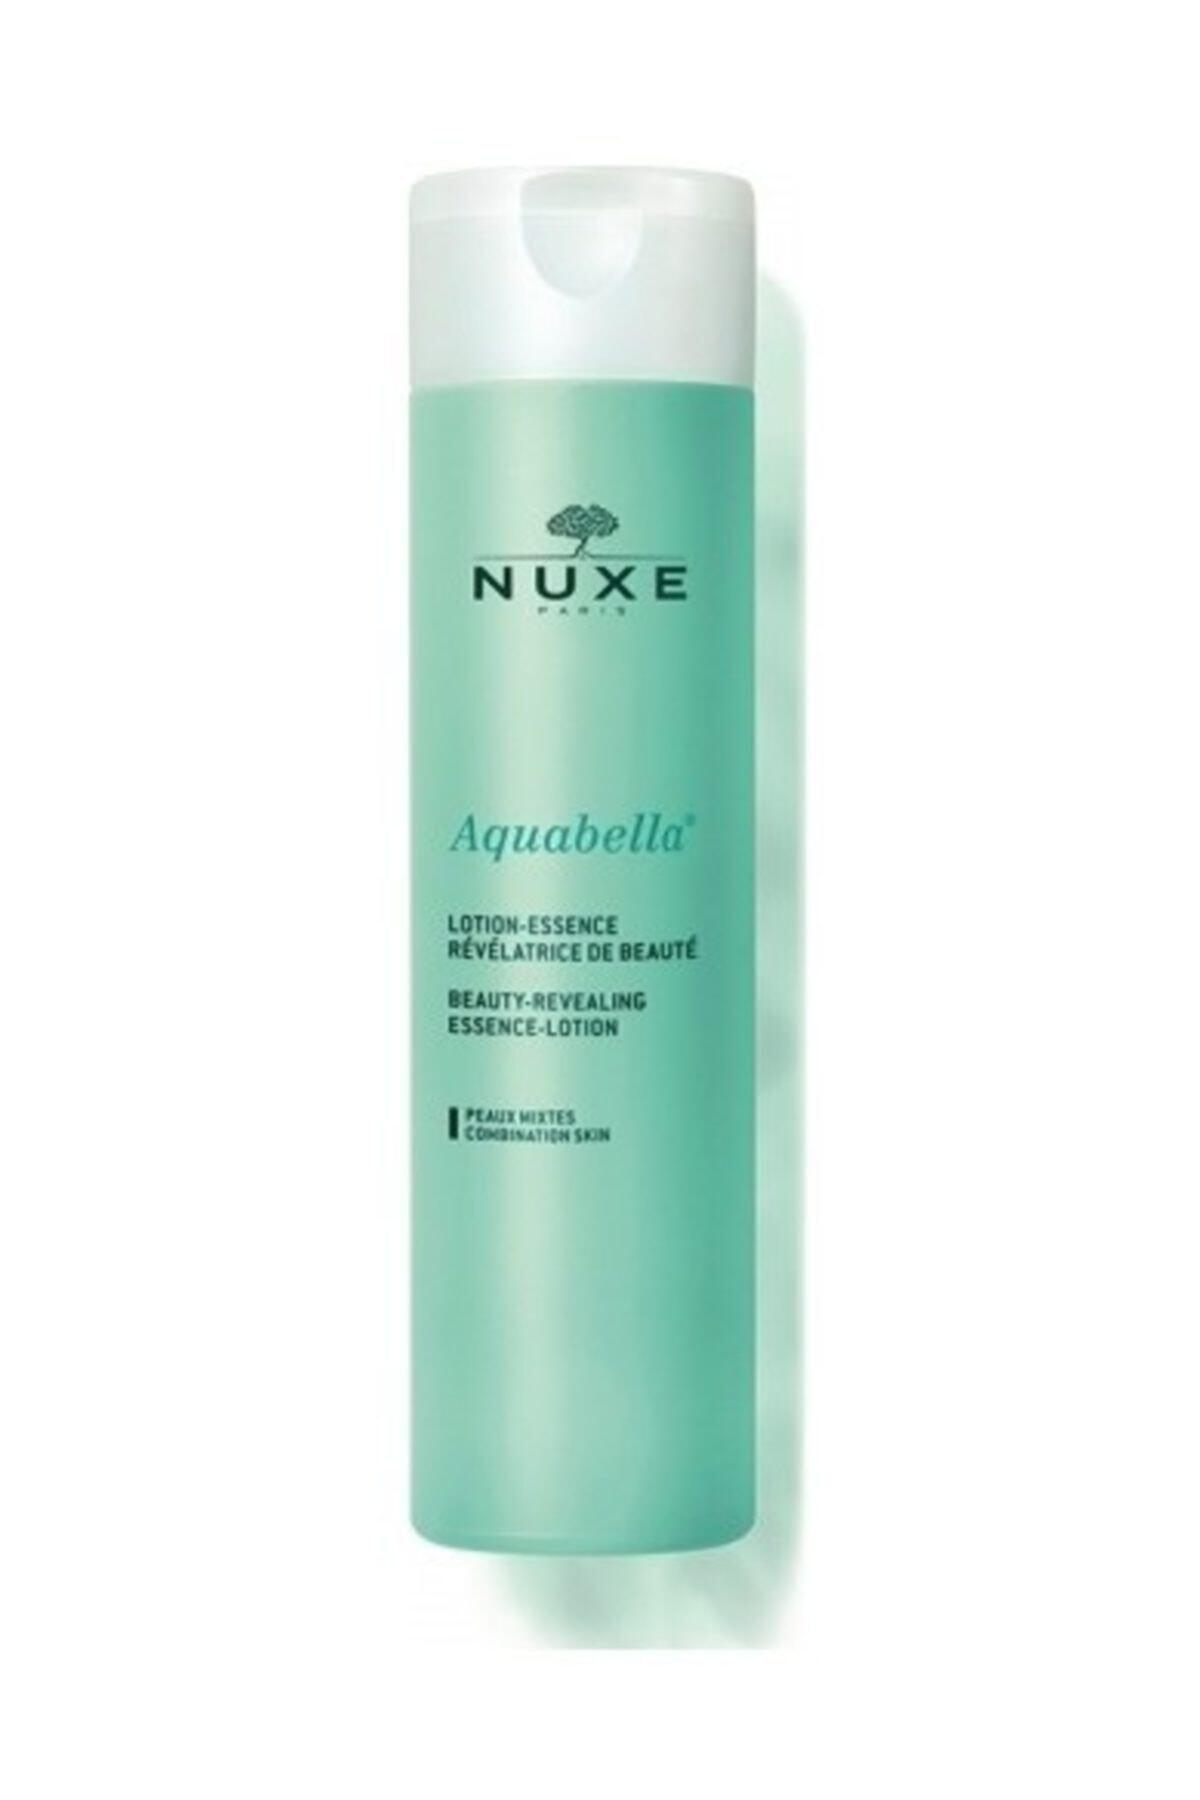 Nuxe Aquabella Beauty Revealing Essence Lotion 200 ml 1